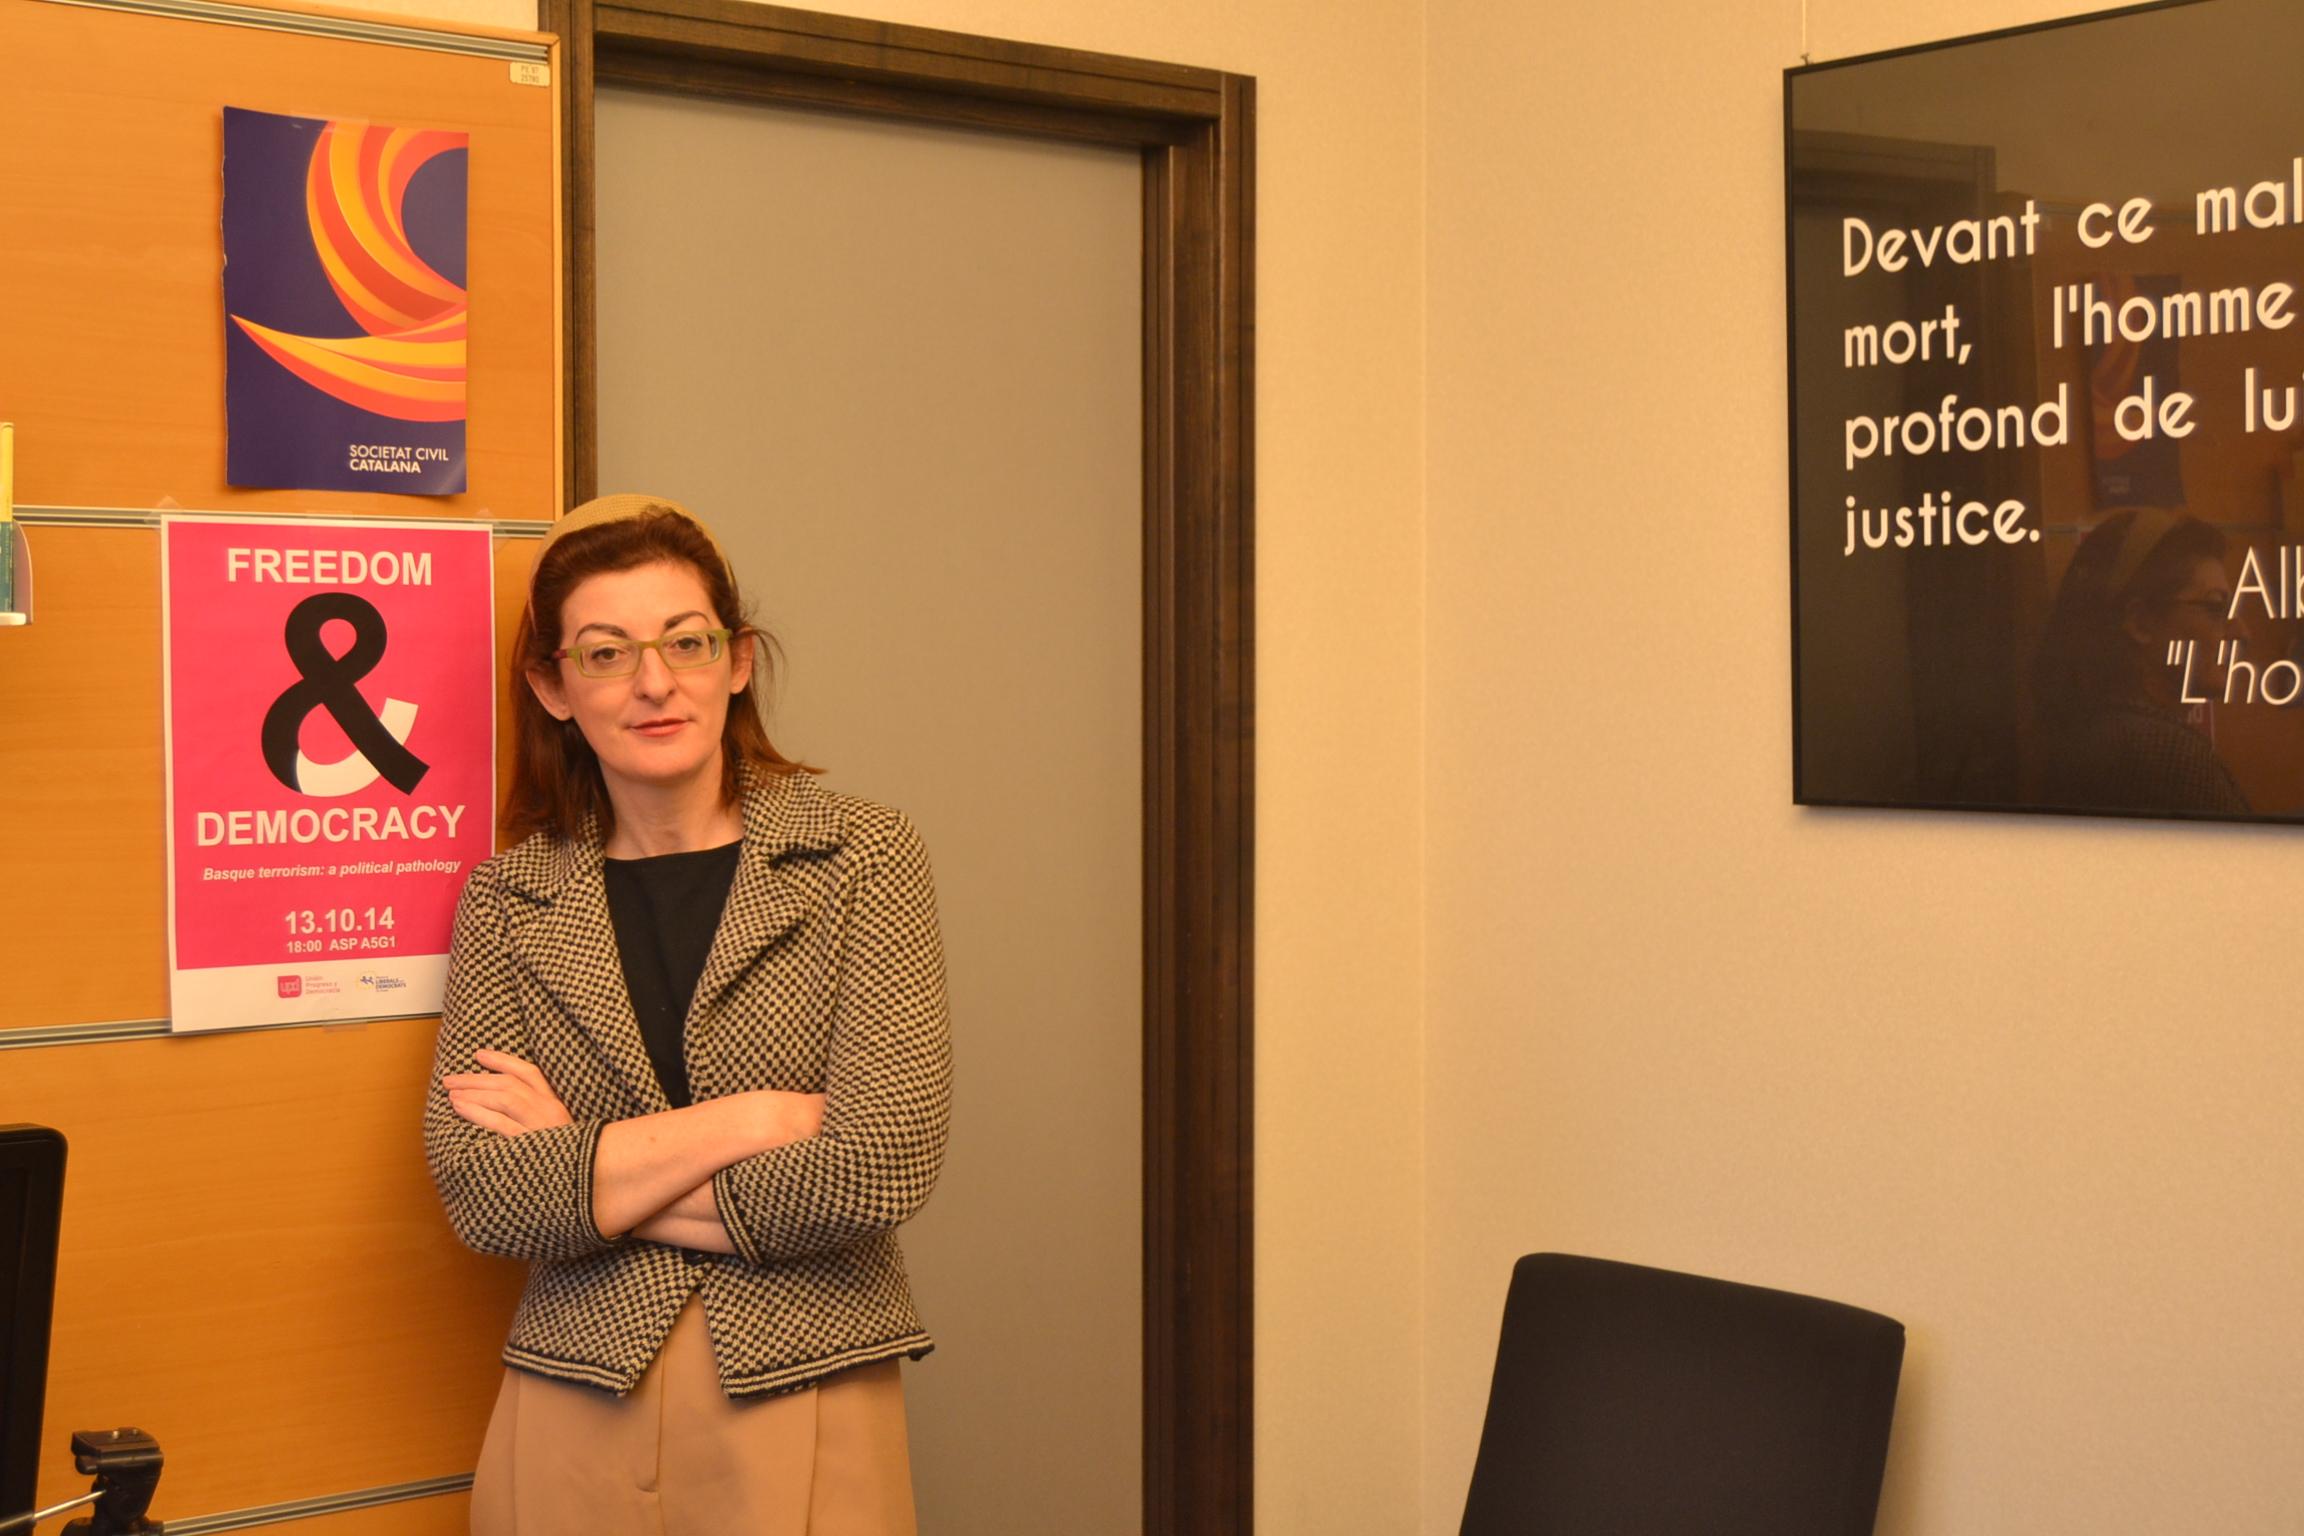 Maite Pagazaurtundúa en su despacho en Bruselas. (Foto: Fernán González)